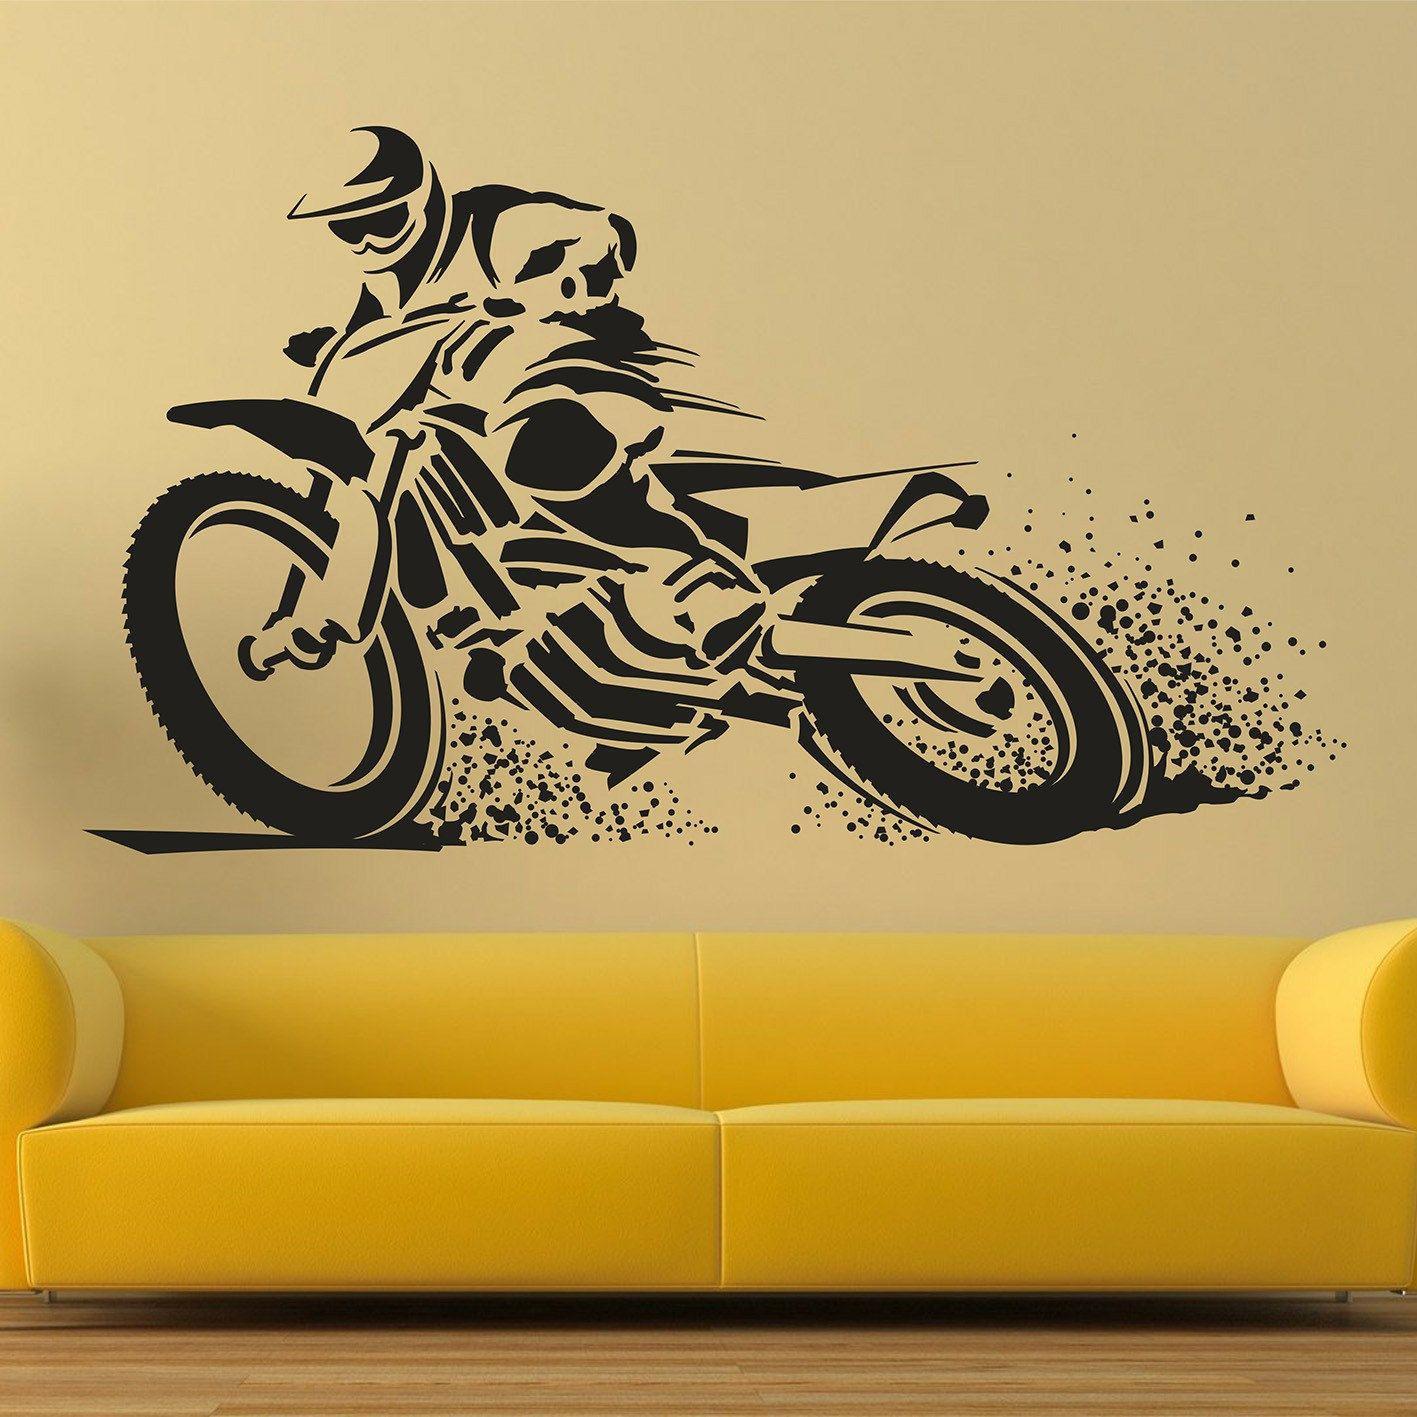 Fantastic Motocross Wall Art Gift - Wall Art Collections ...